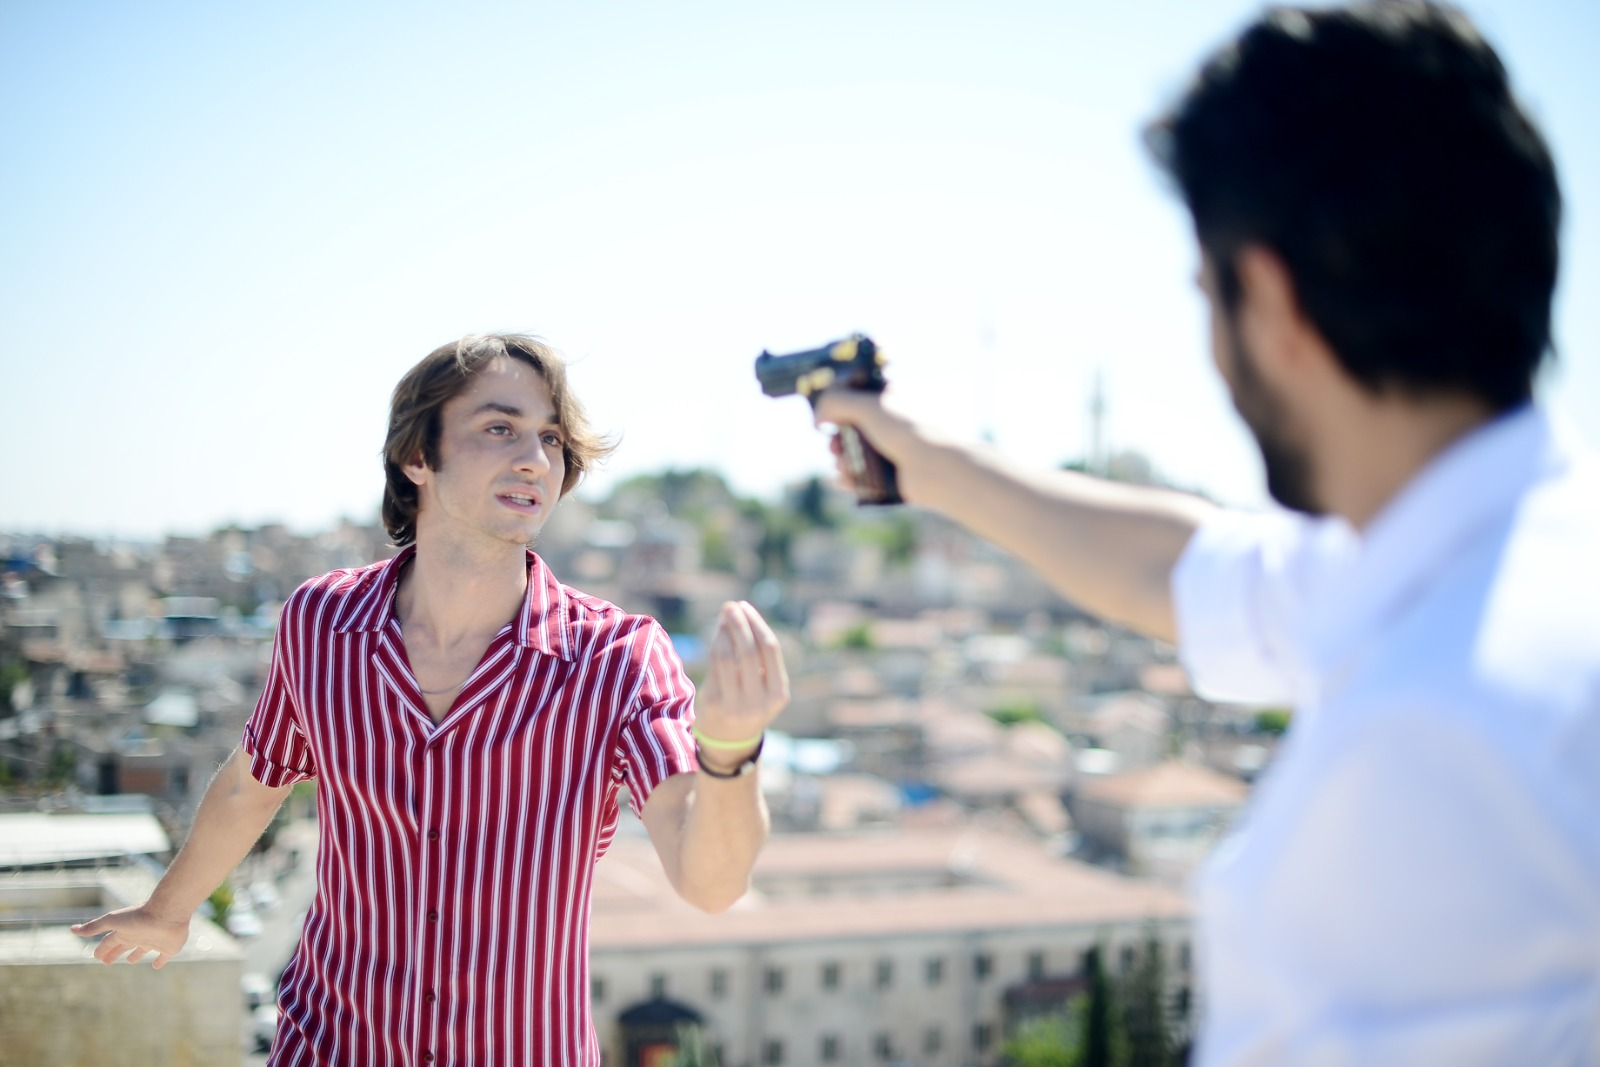 Benim Adim Melek: Season 1, Episode 2 Photo